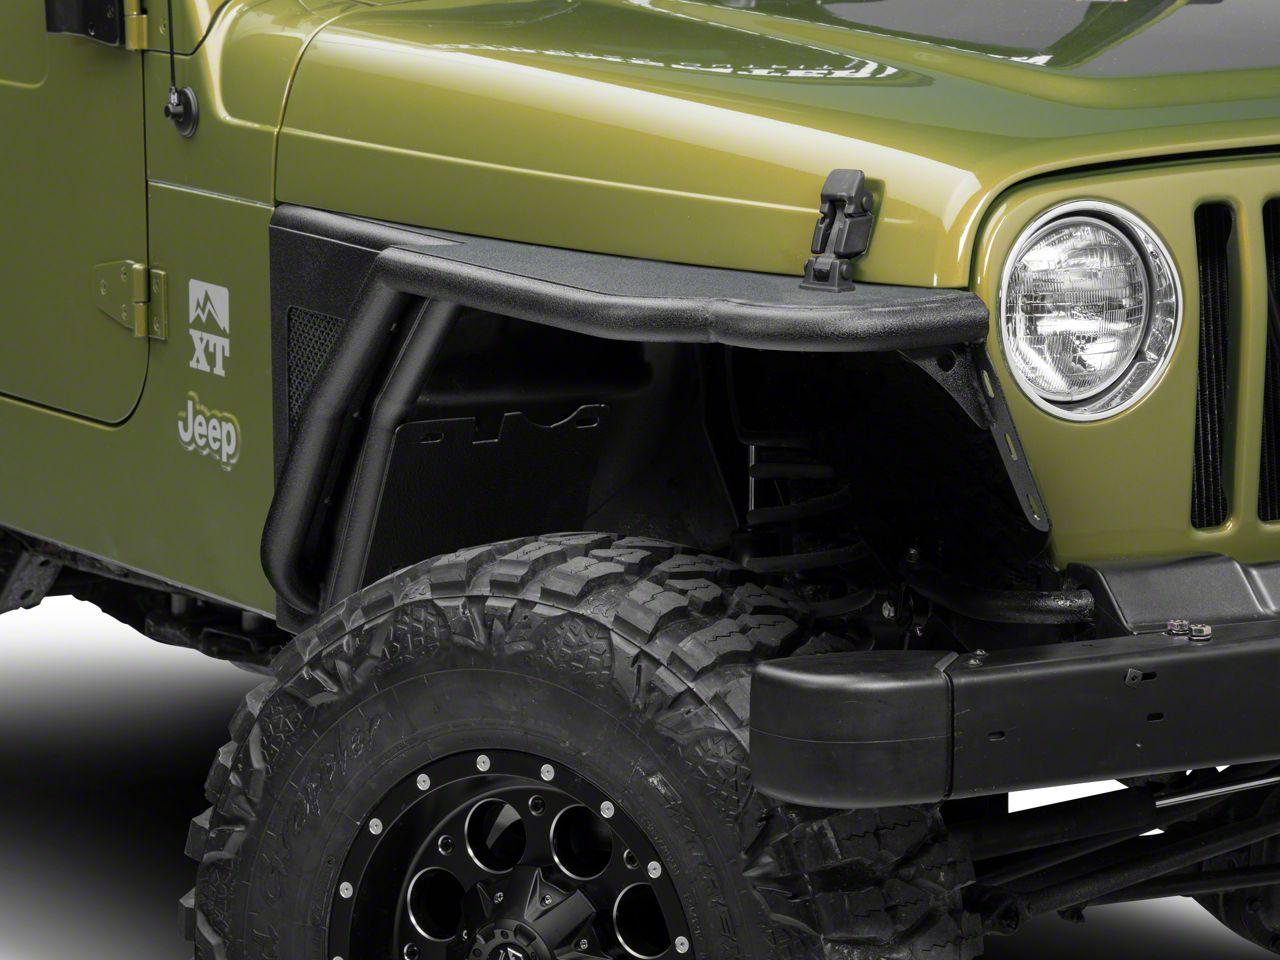 Barricade Front & Rear Fender Flares (97-06 Jeep Wrangler TJ)